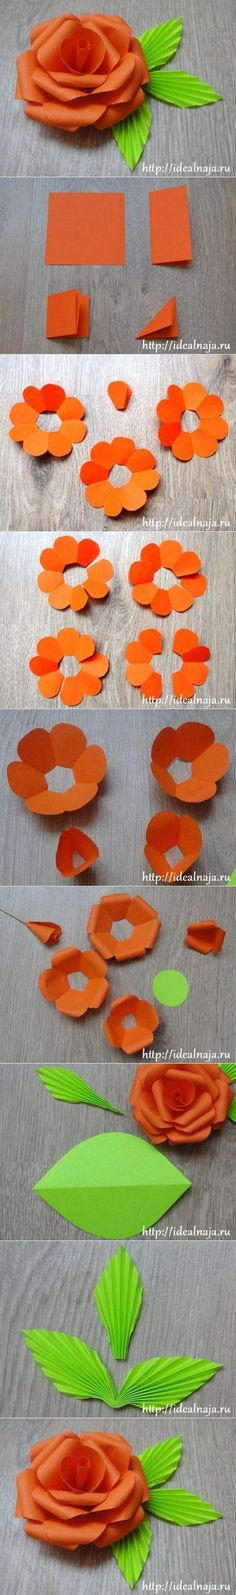 DIY Easy Paper Rose DIY Projects | UsefulDIY.com Follow us on Facebook ==> https://www.facebook.com/UsefulDiy